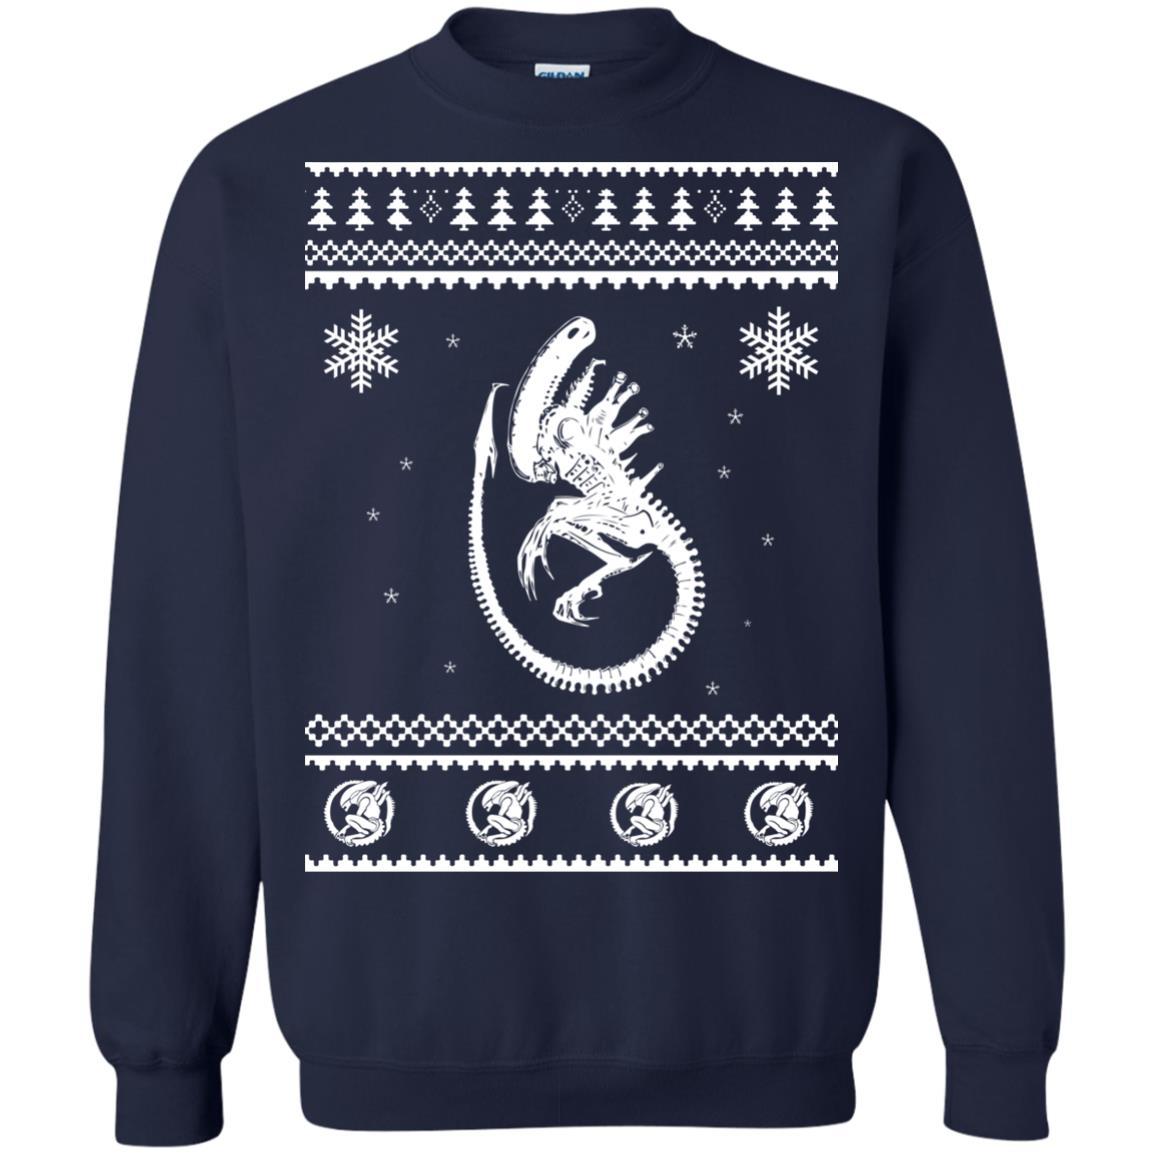 image 2848 - Xeno-mas - Aliens Xenomorph Christmas Sweater, Shirt, Hoodie